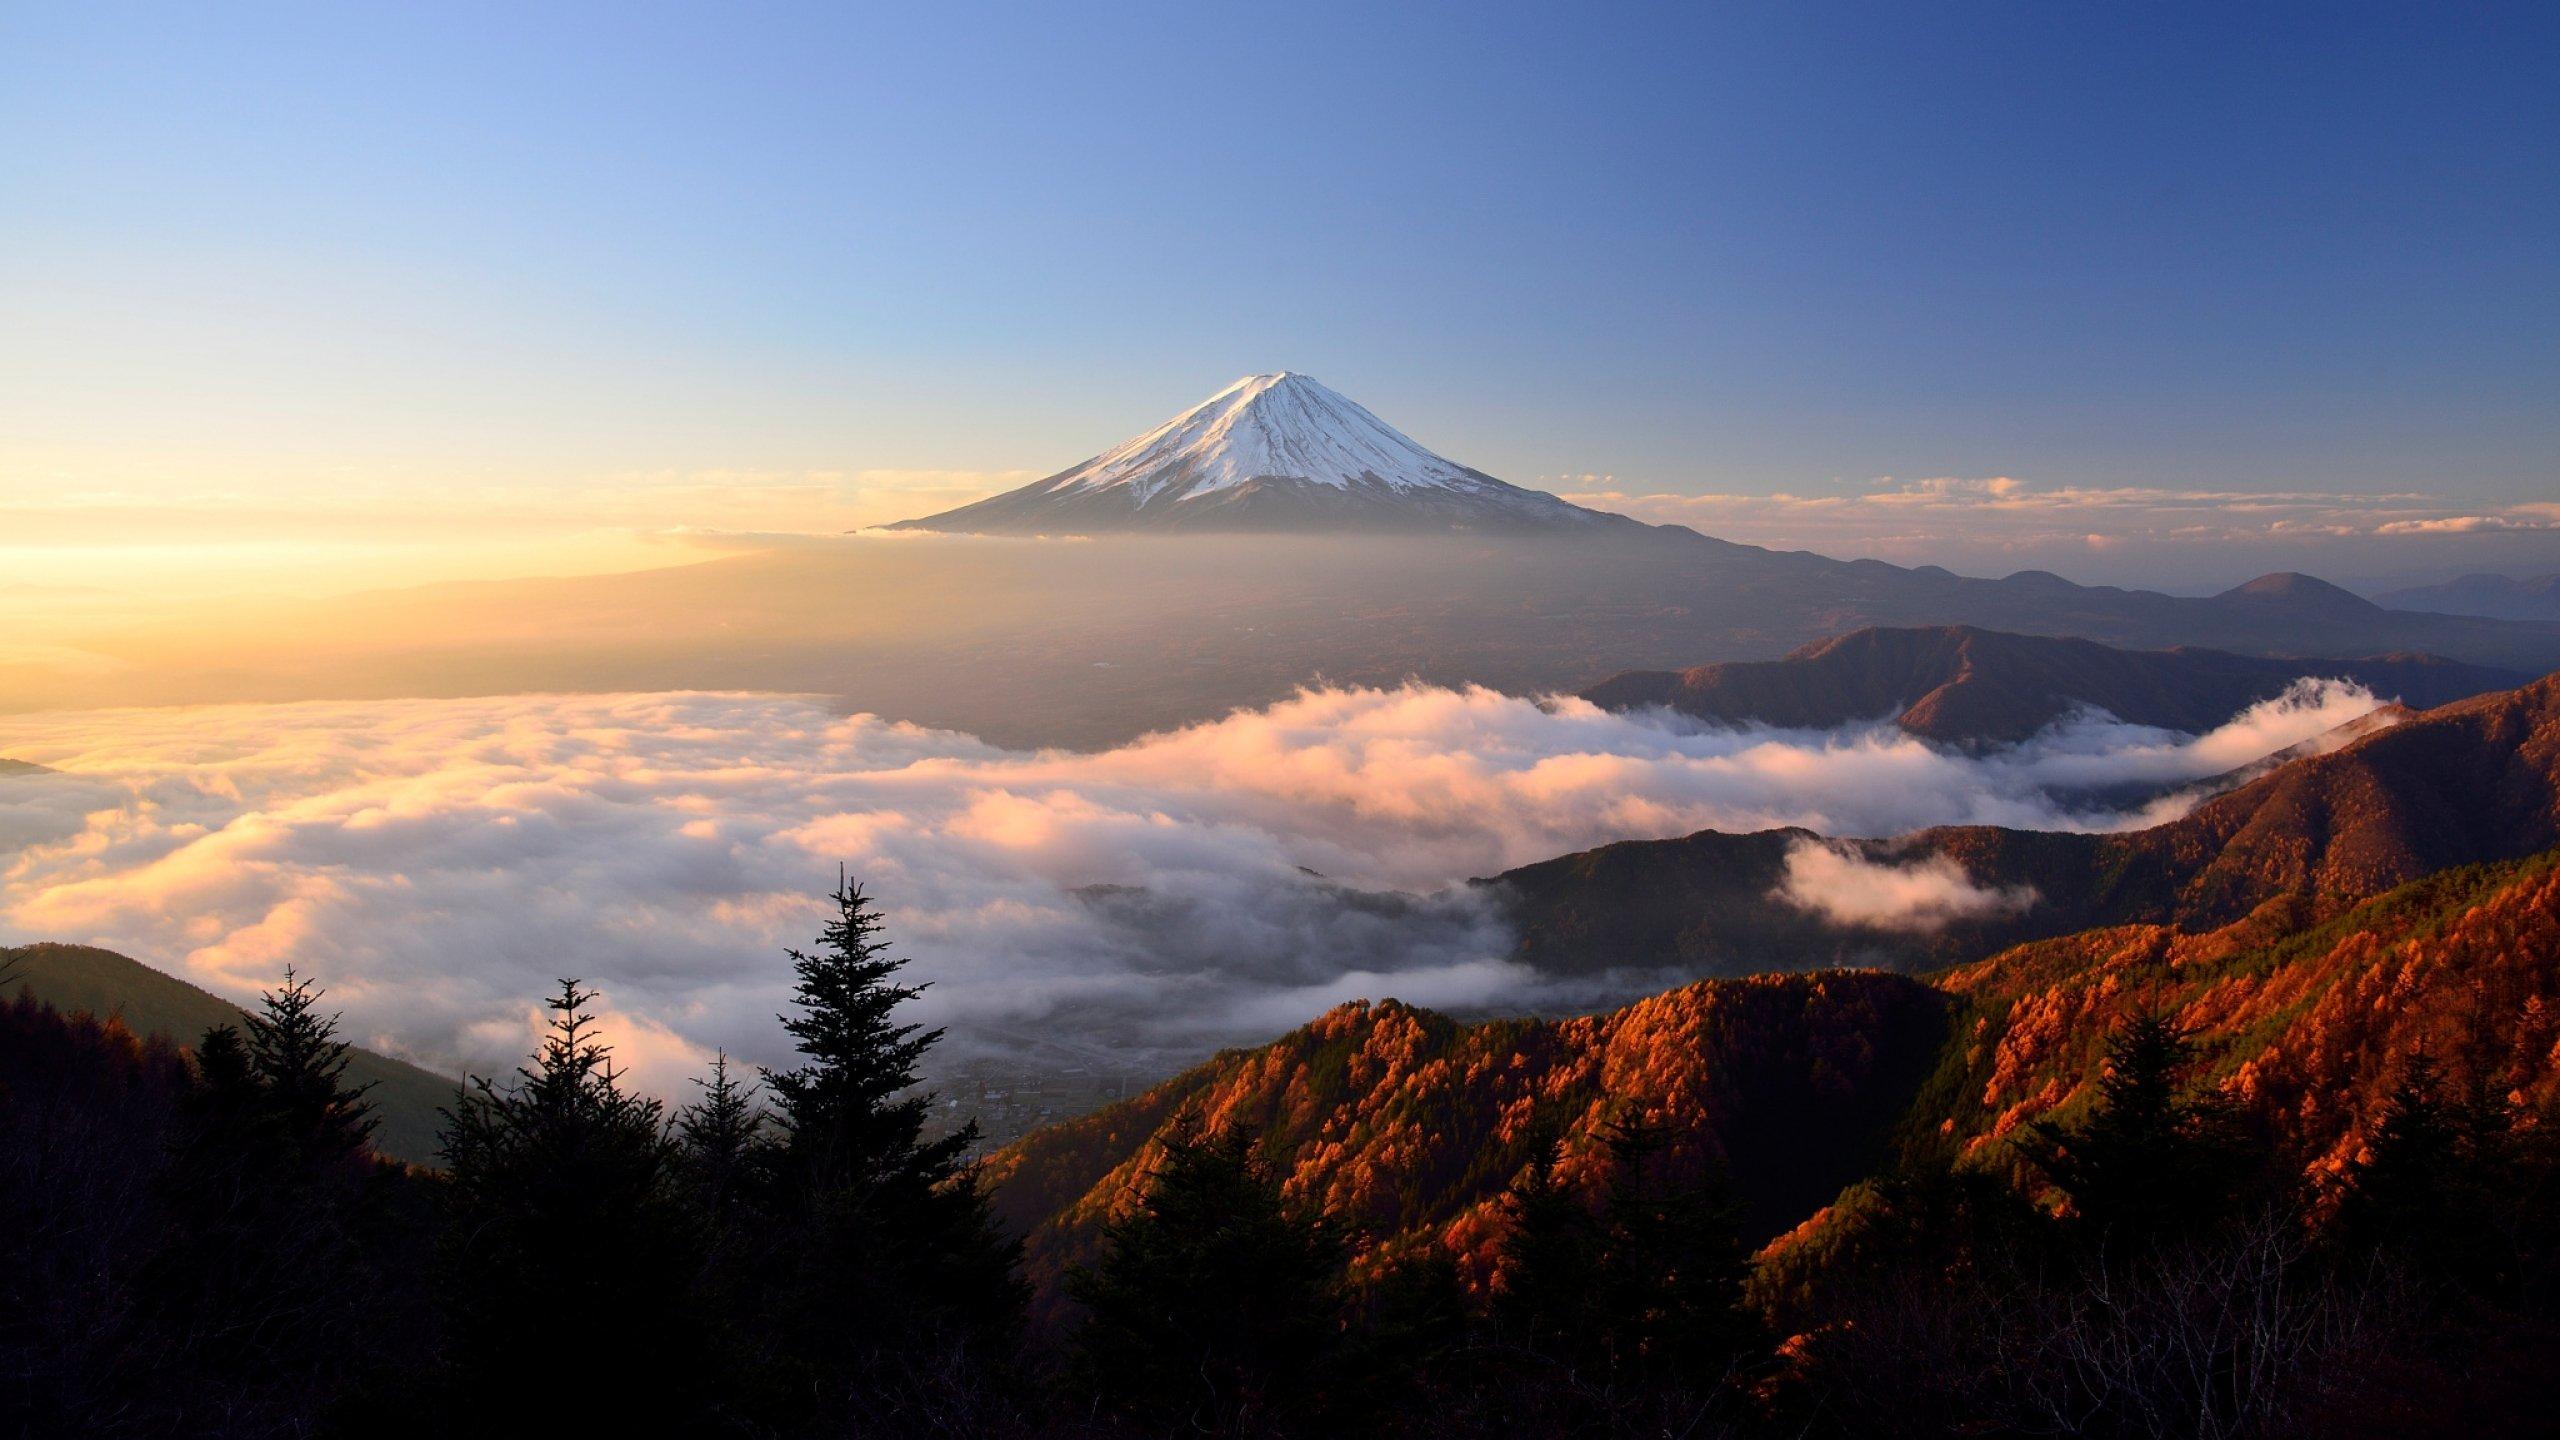 Mount Fuji [2560x1440] wallpapers 2560x1440